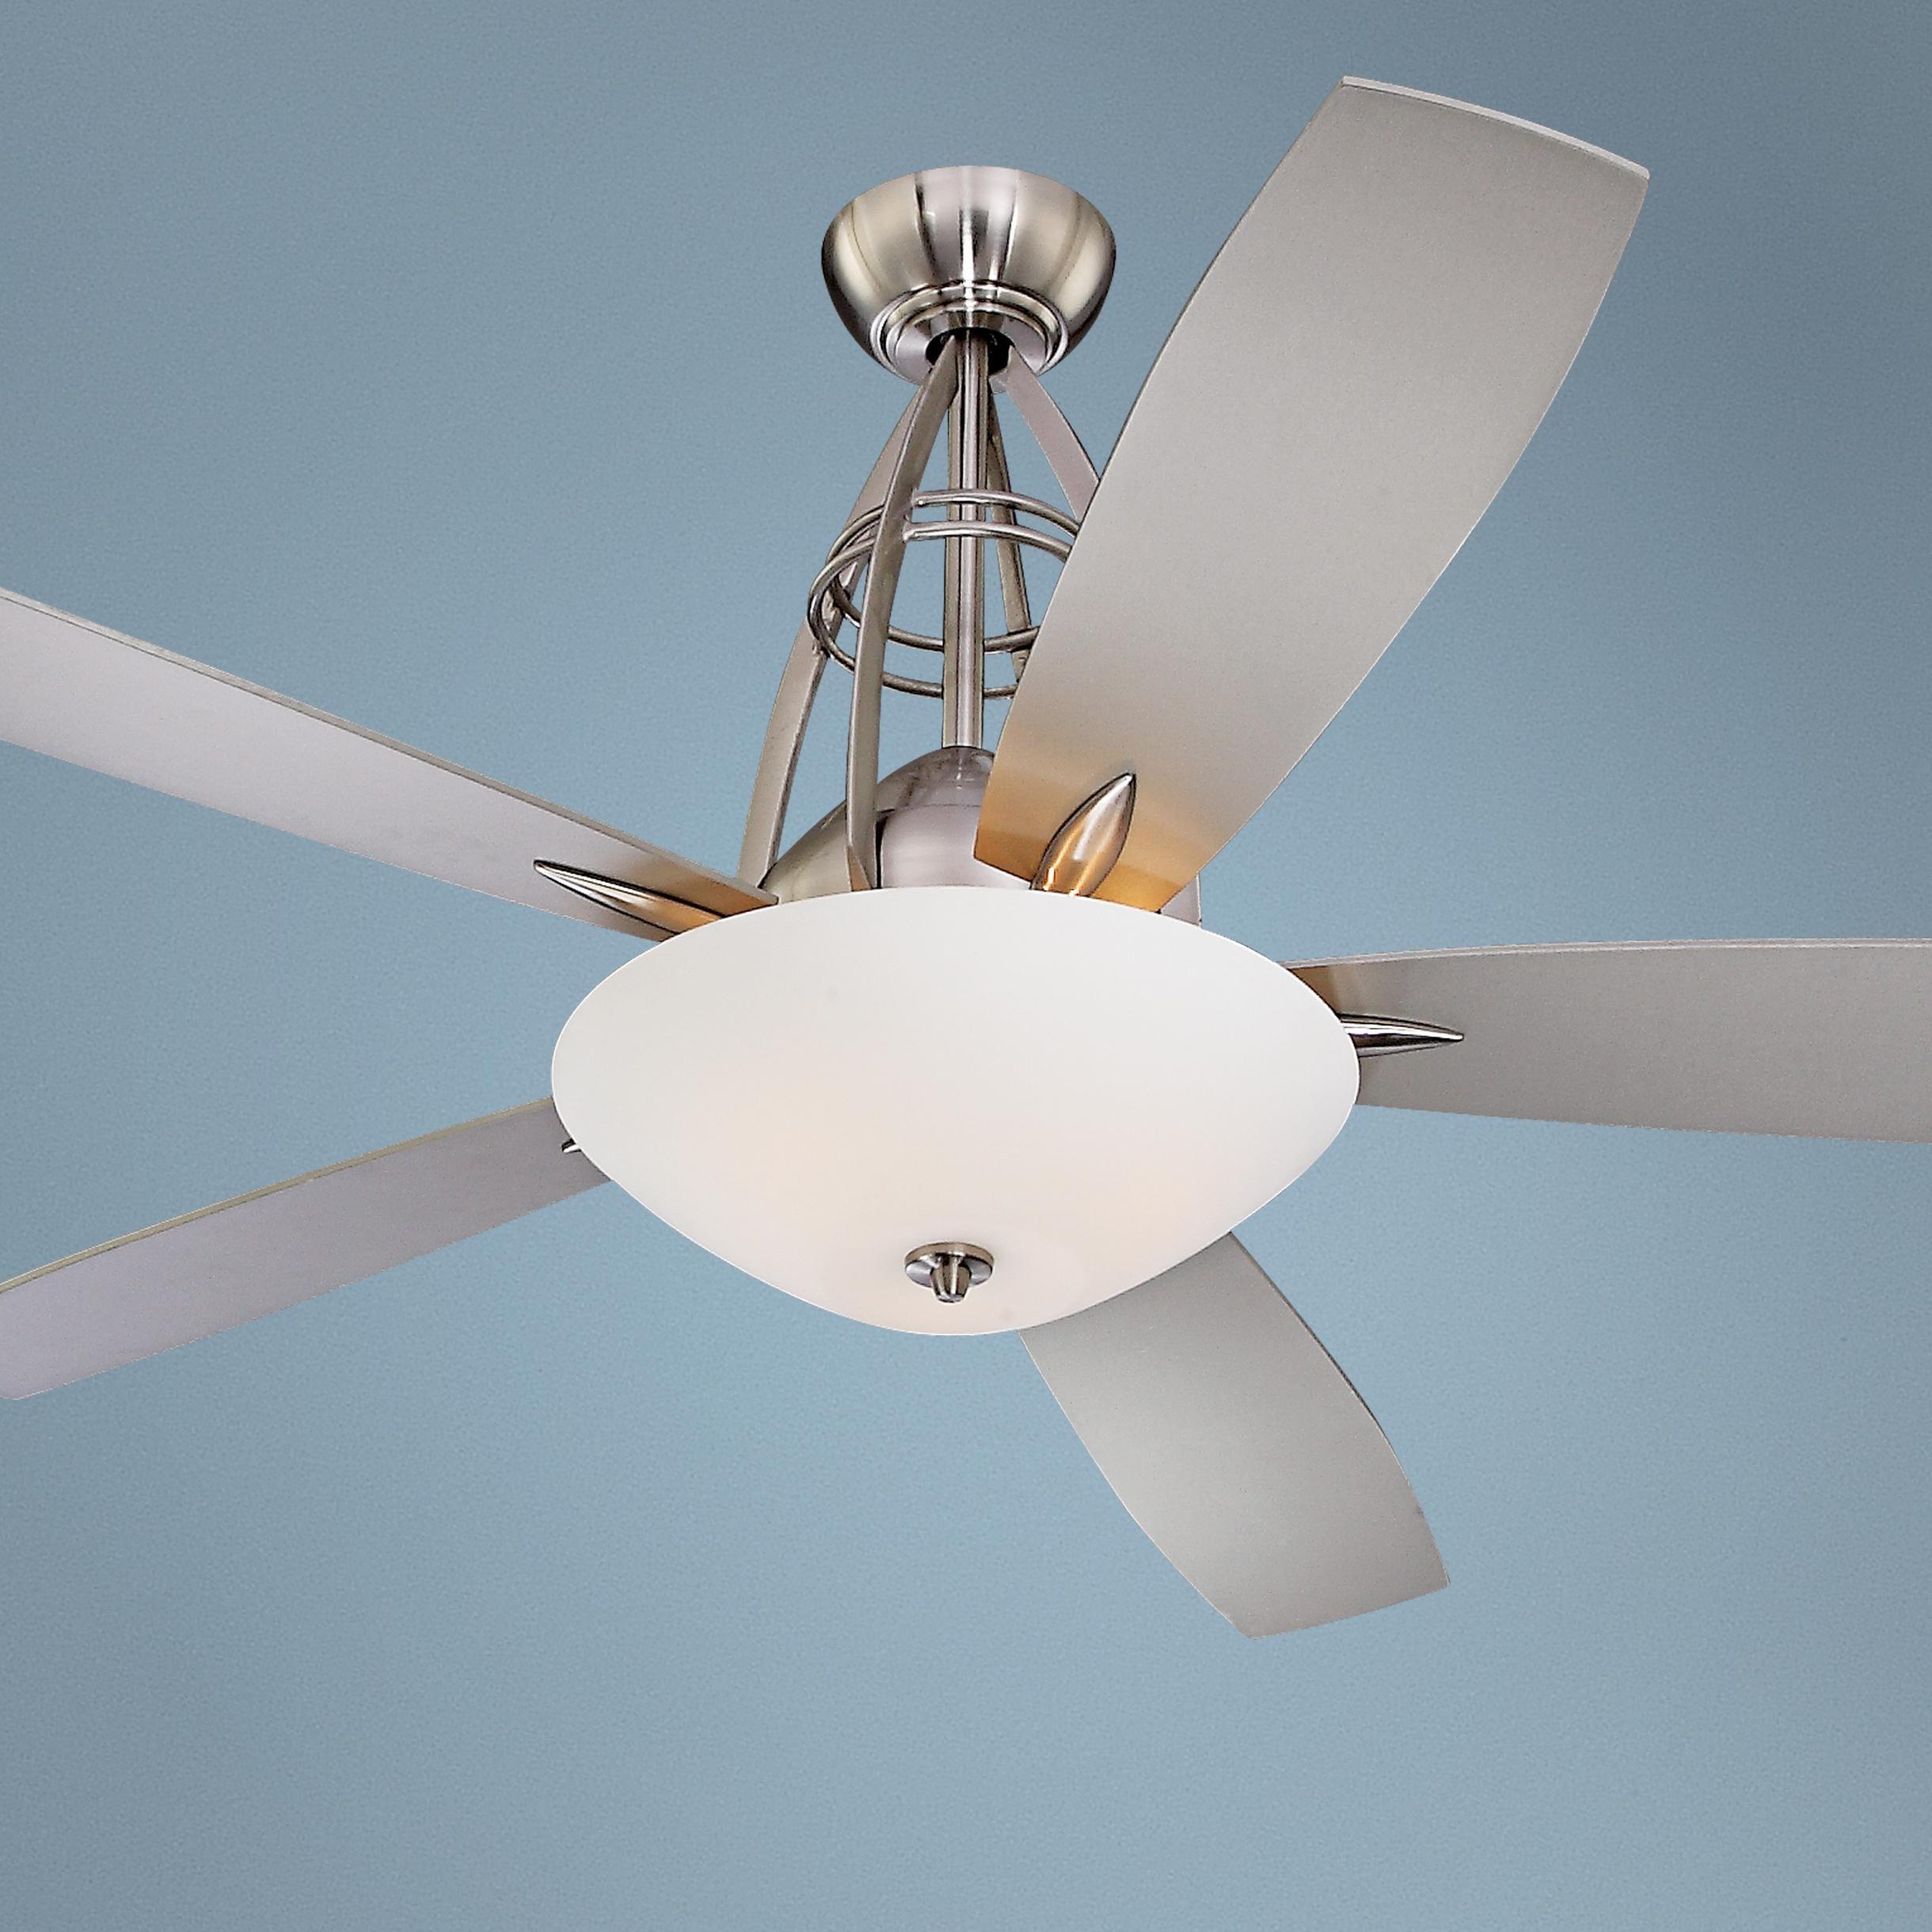 60 Possini Euro Design Palo Alto Ceiling Fan Lampspluscom